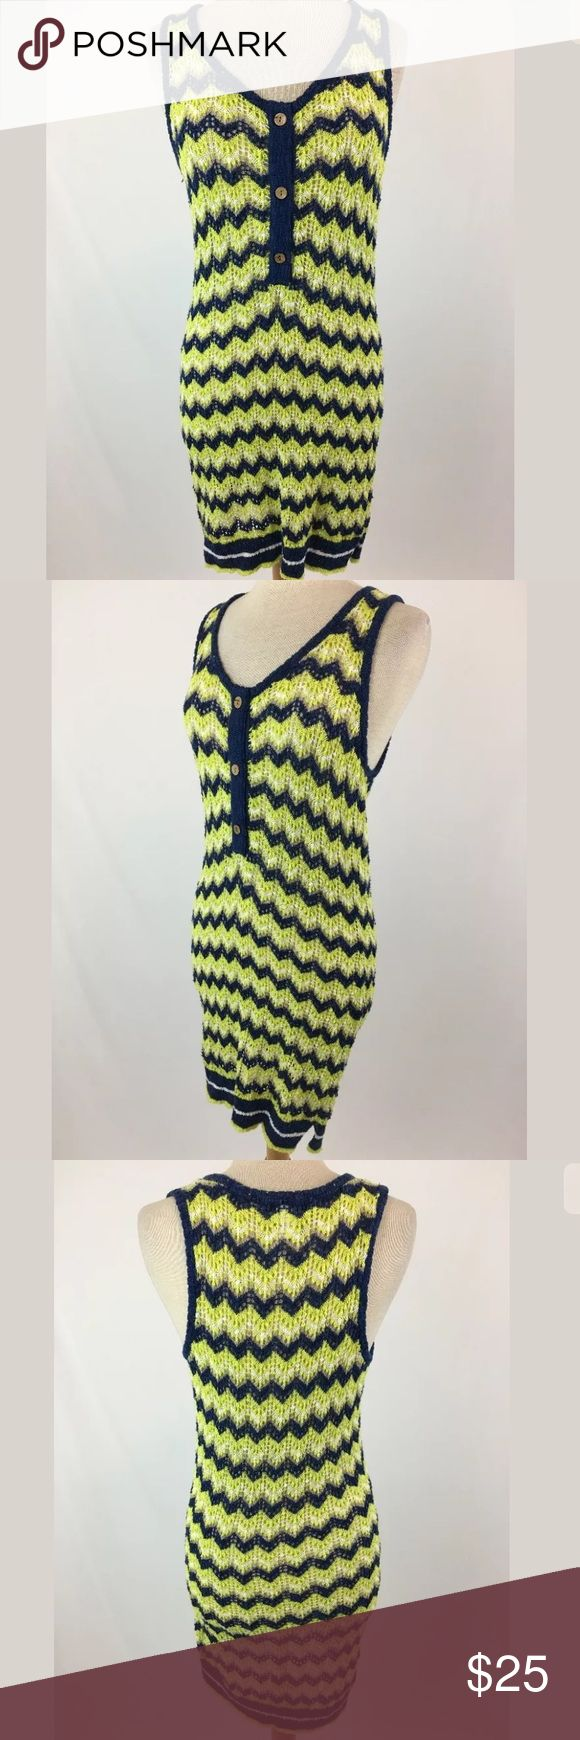 Charlotte Ronson dress SKU: SD15404  Length Shoulder To Hem: 39 Bust: 37 Waist: 33 Fabric Content: 52% cotton, 34% rayon, 14% linen Charlotte Ronson Dresses